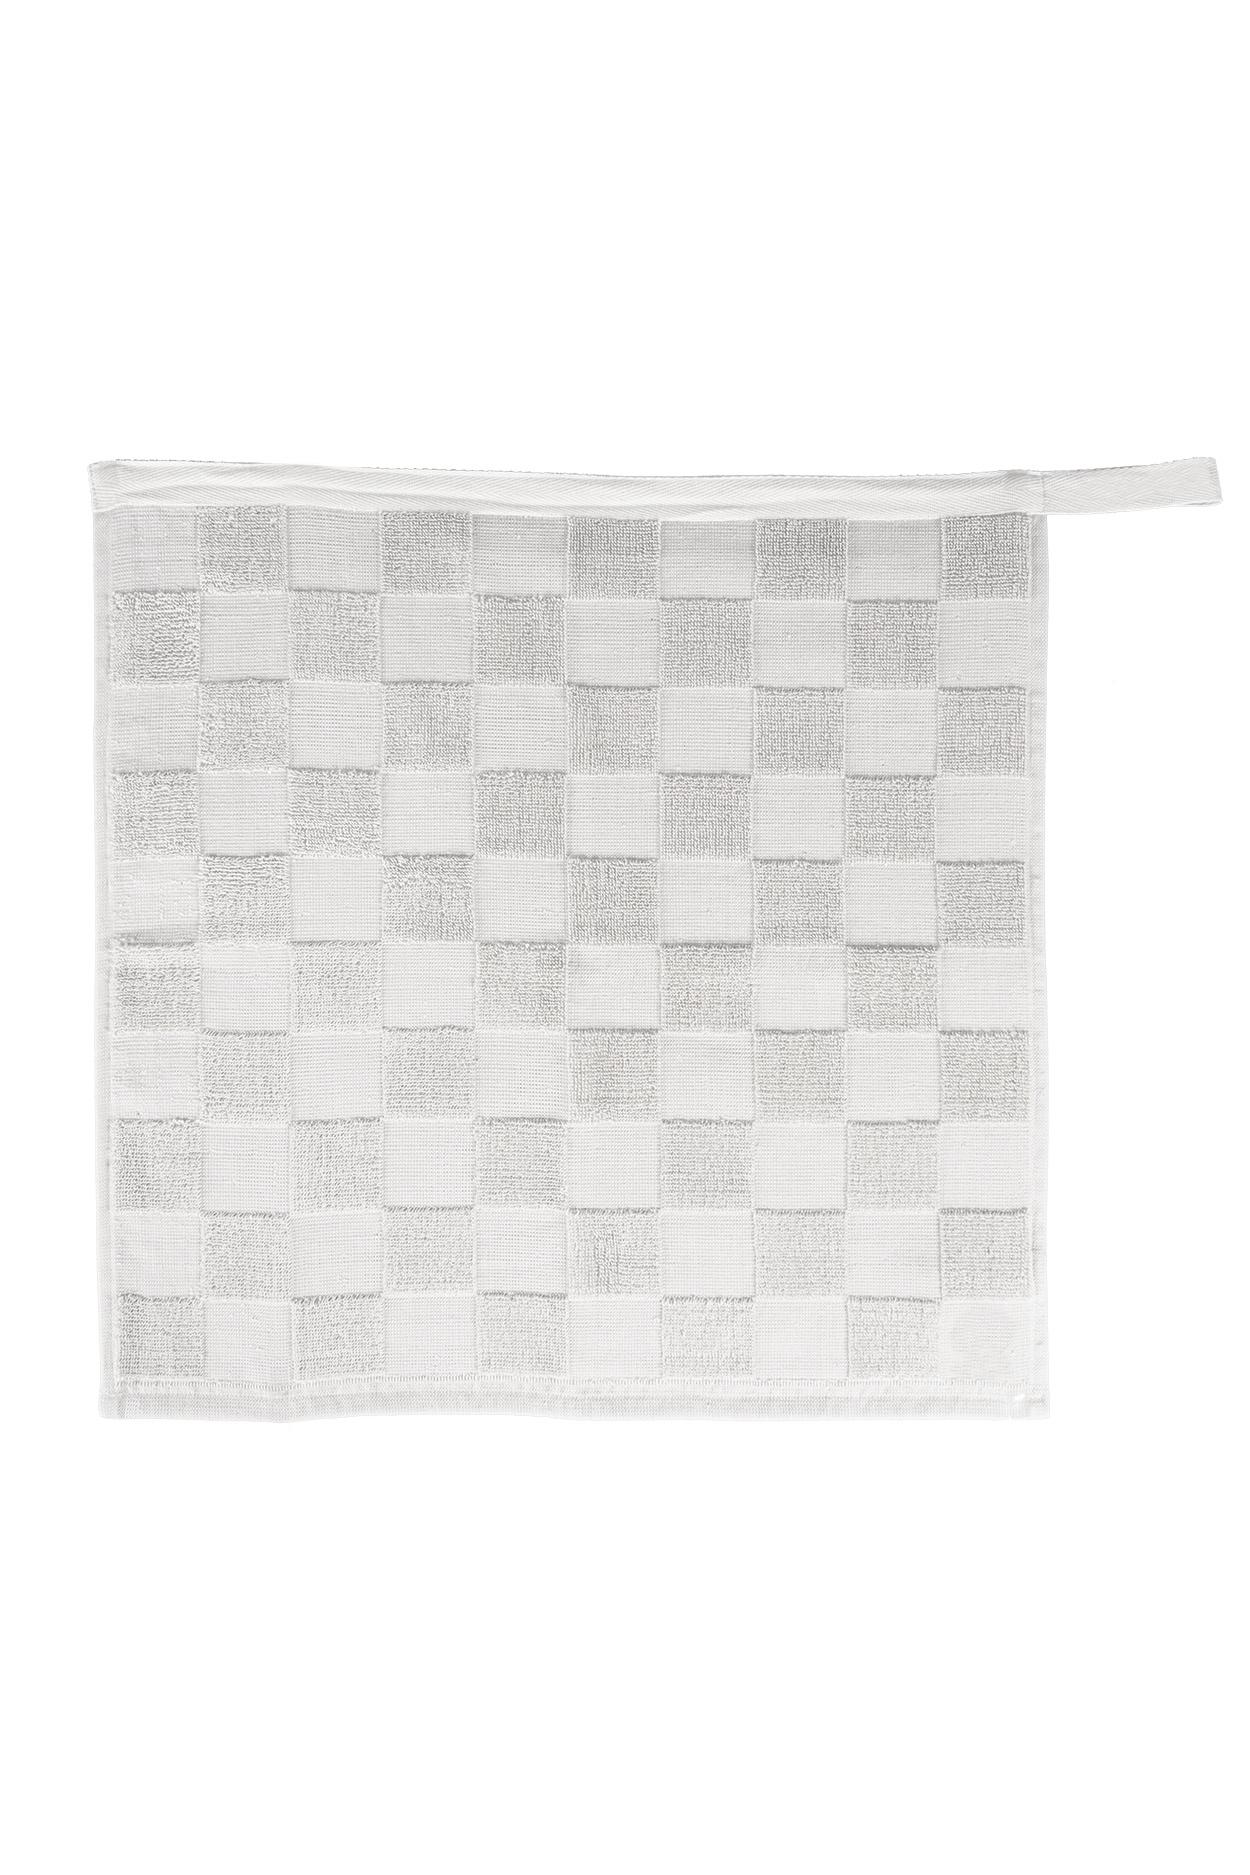 Zusss Handdoek geblokt wit 50x50cm